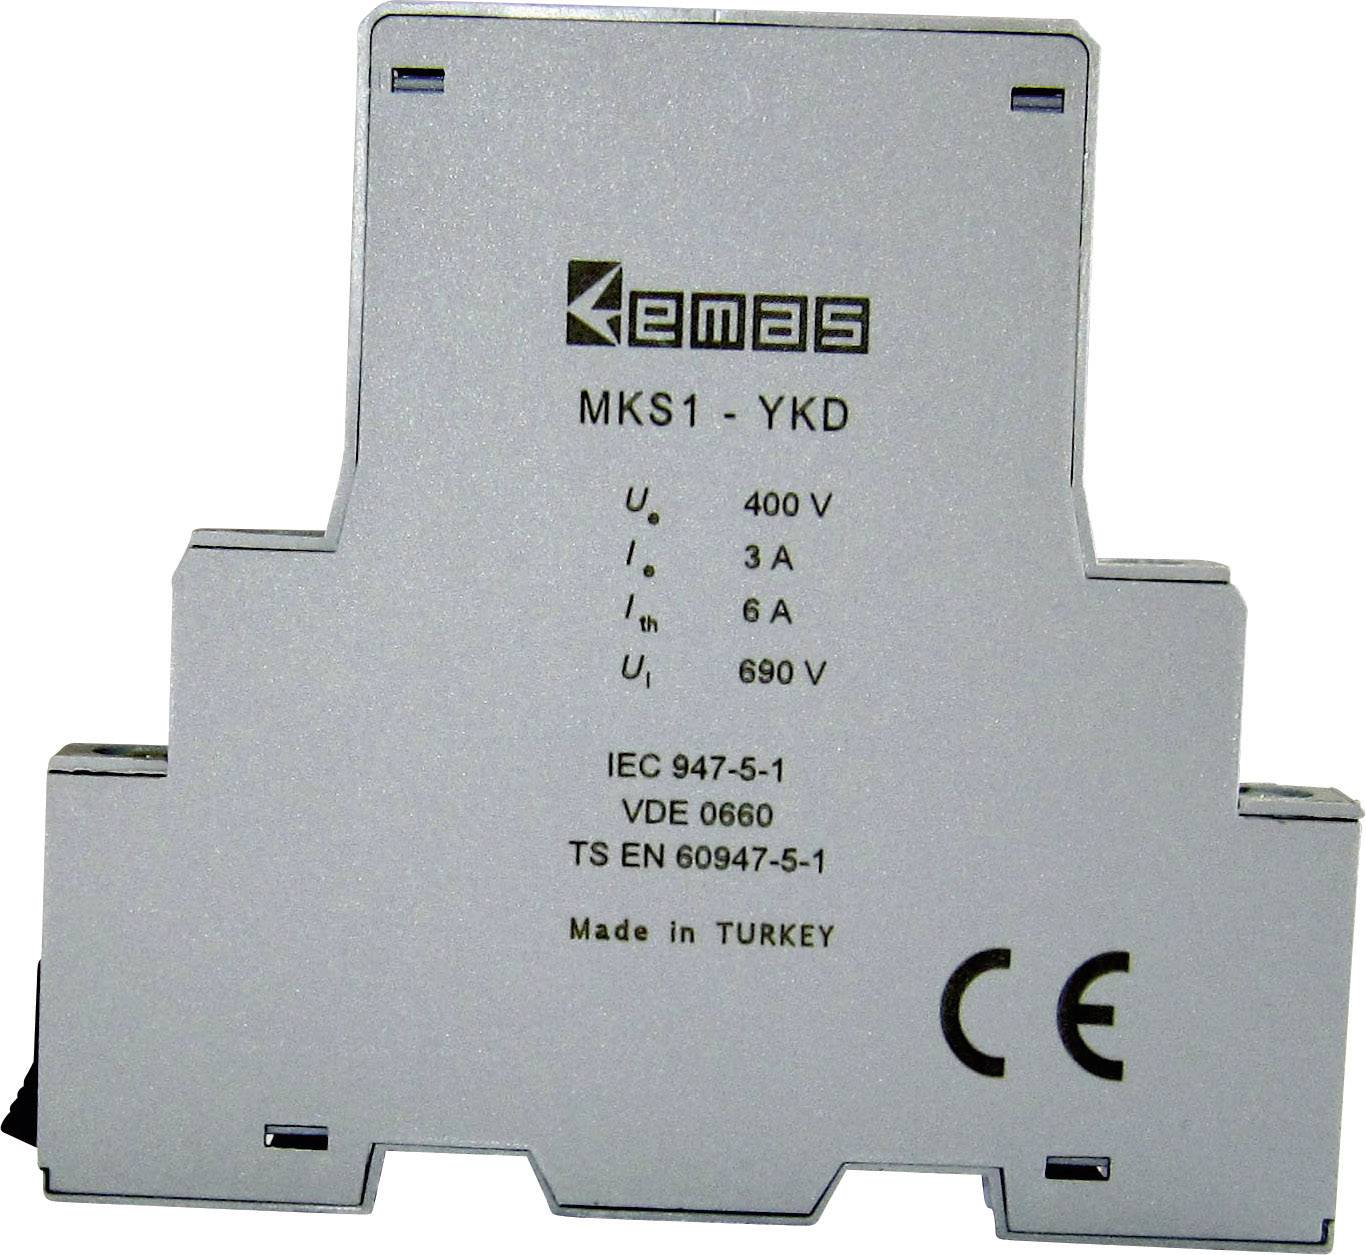 Pomocný spínač EMAS MKS1-YKD01 MKS1-YKD01, 1 spínací, 1 rozpínací, 400 V/AC, 3 A, 1 ks